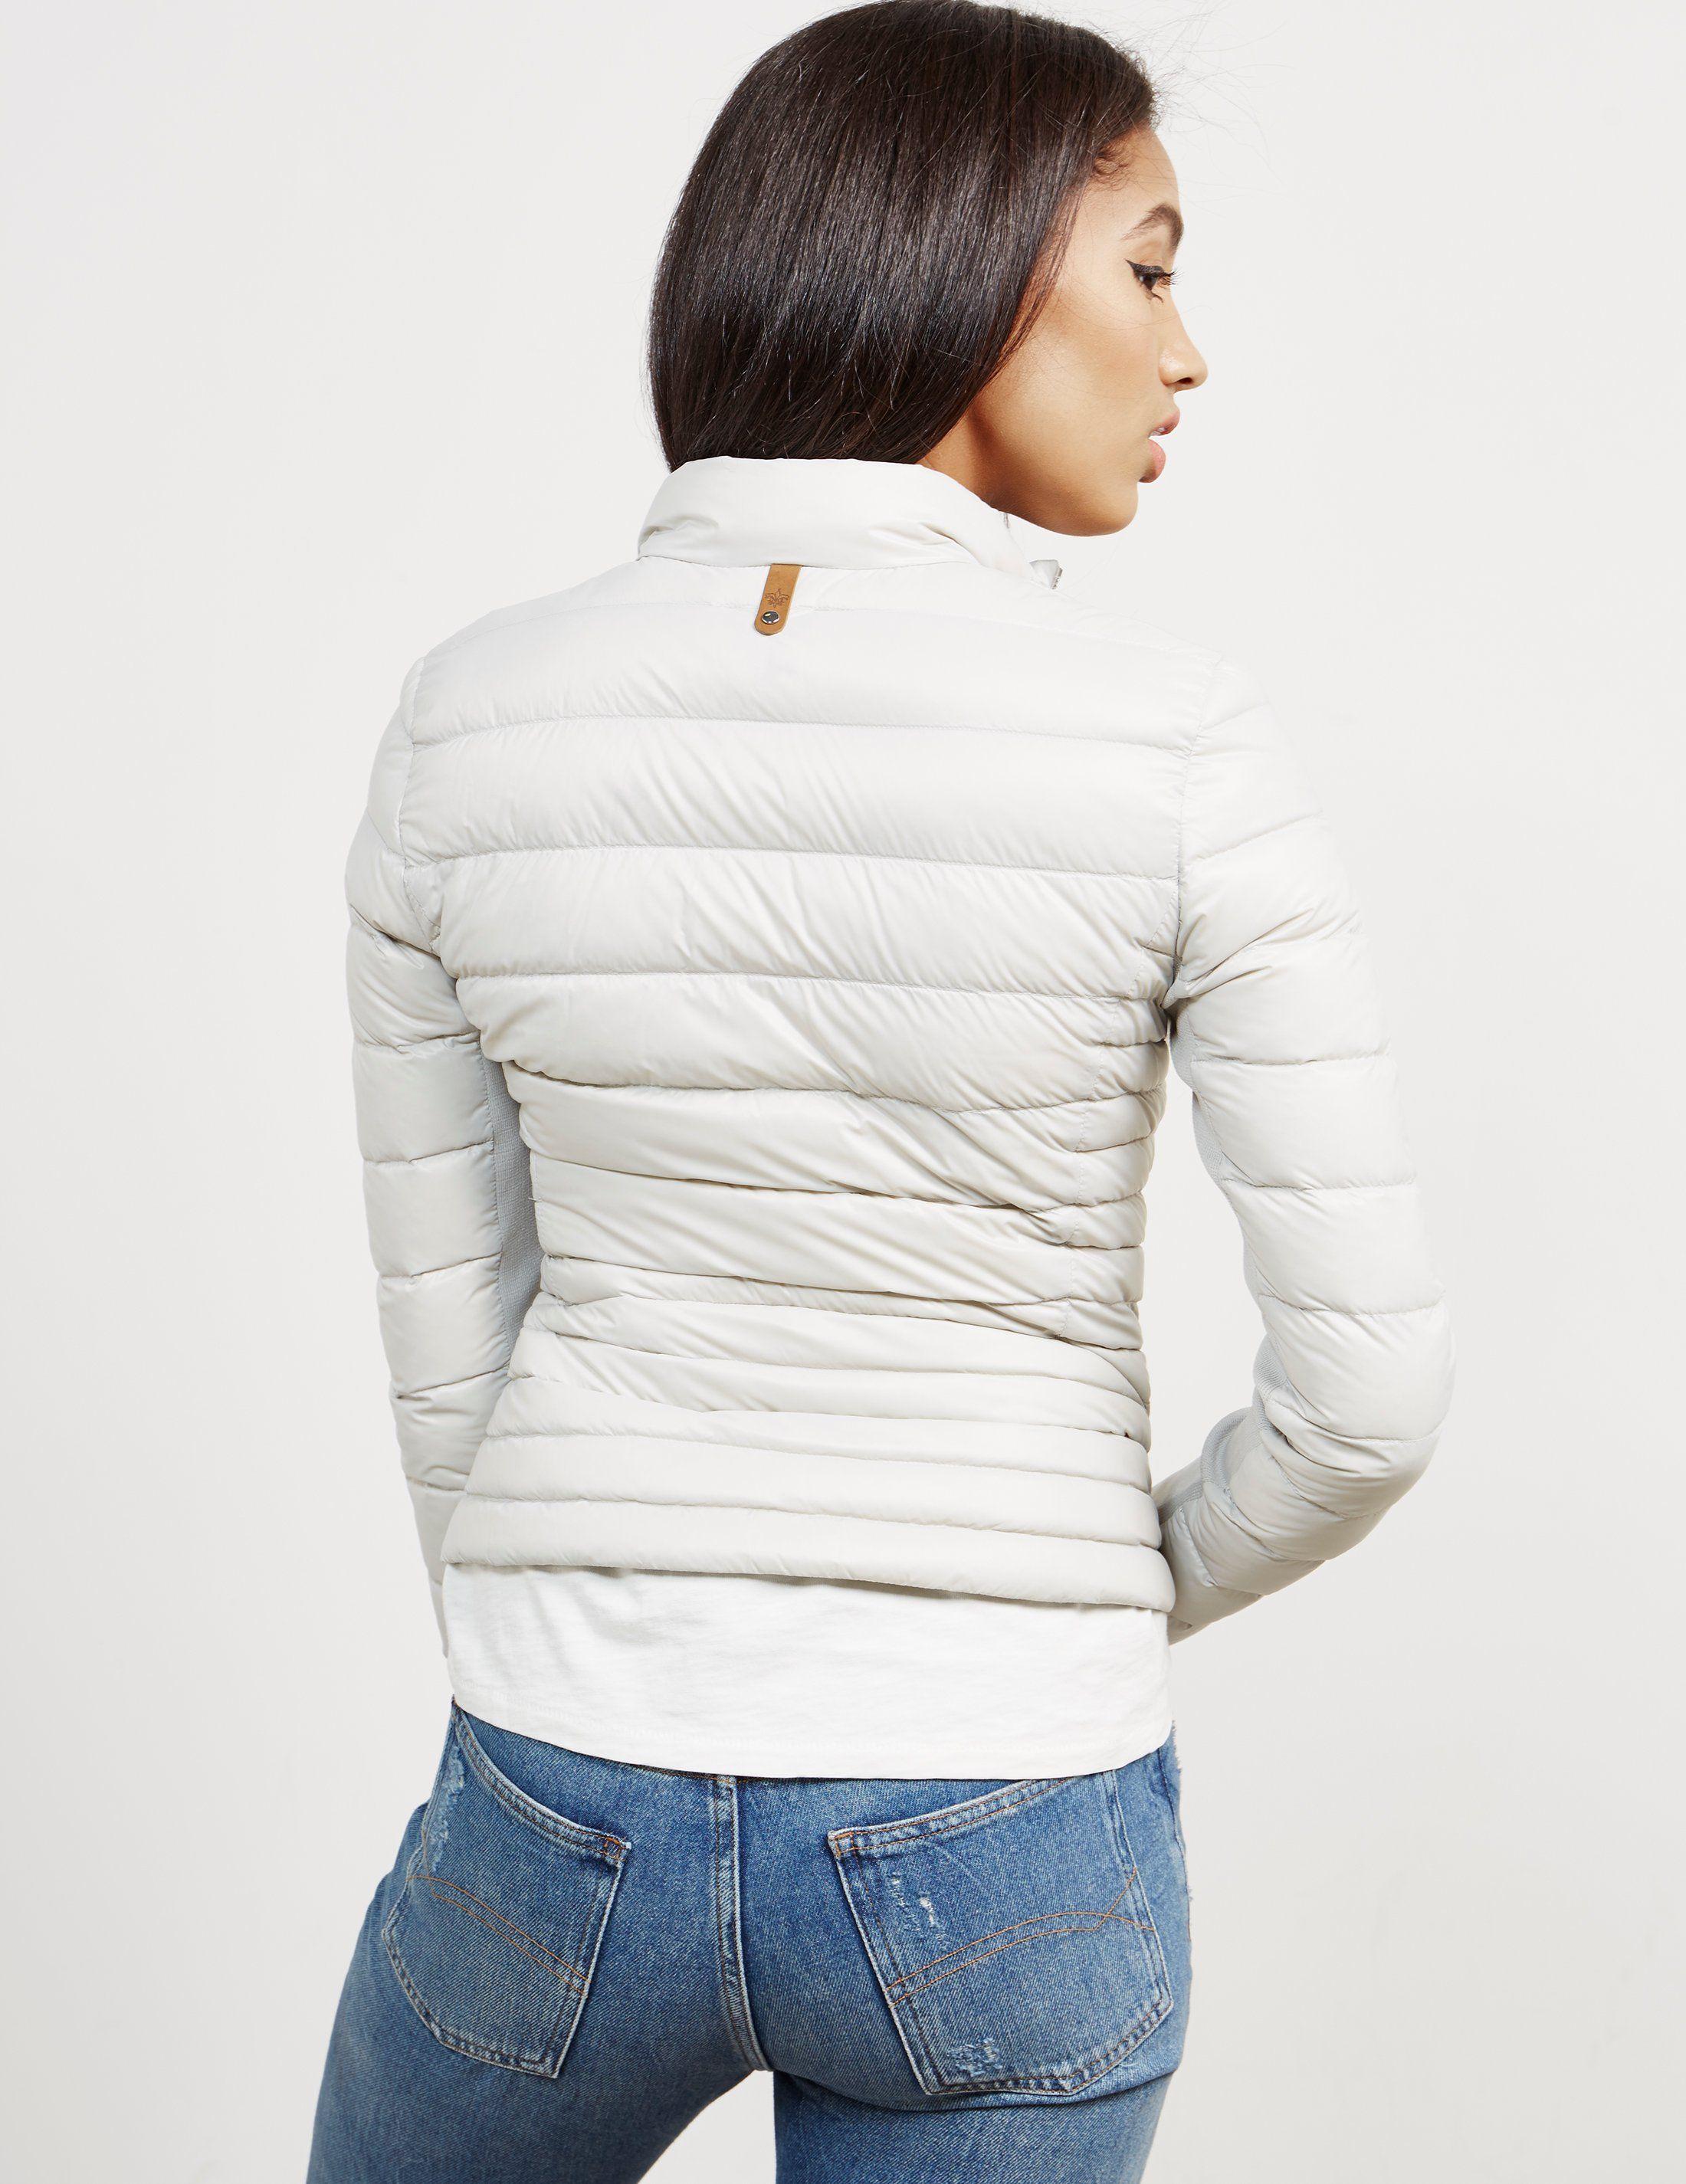 Mackage Cindee Jacket